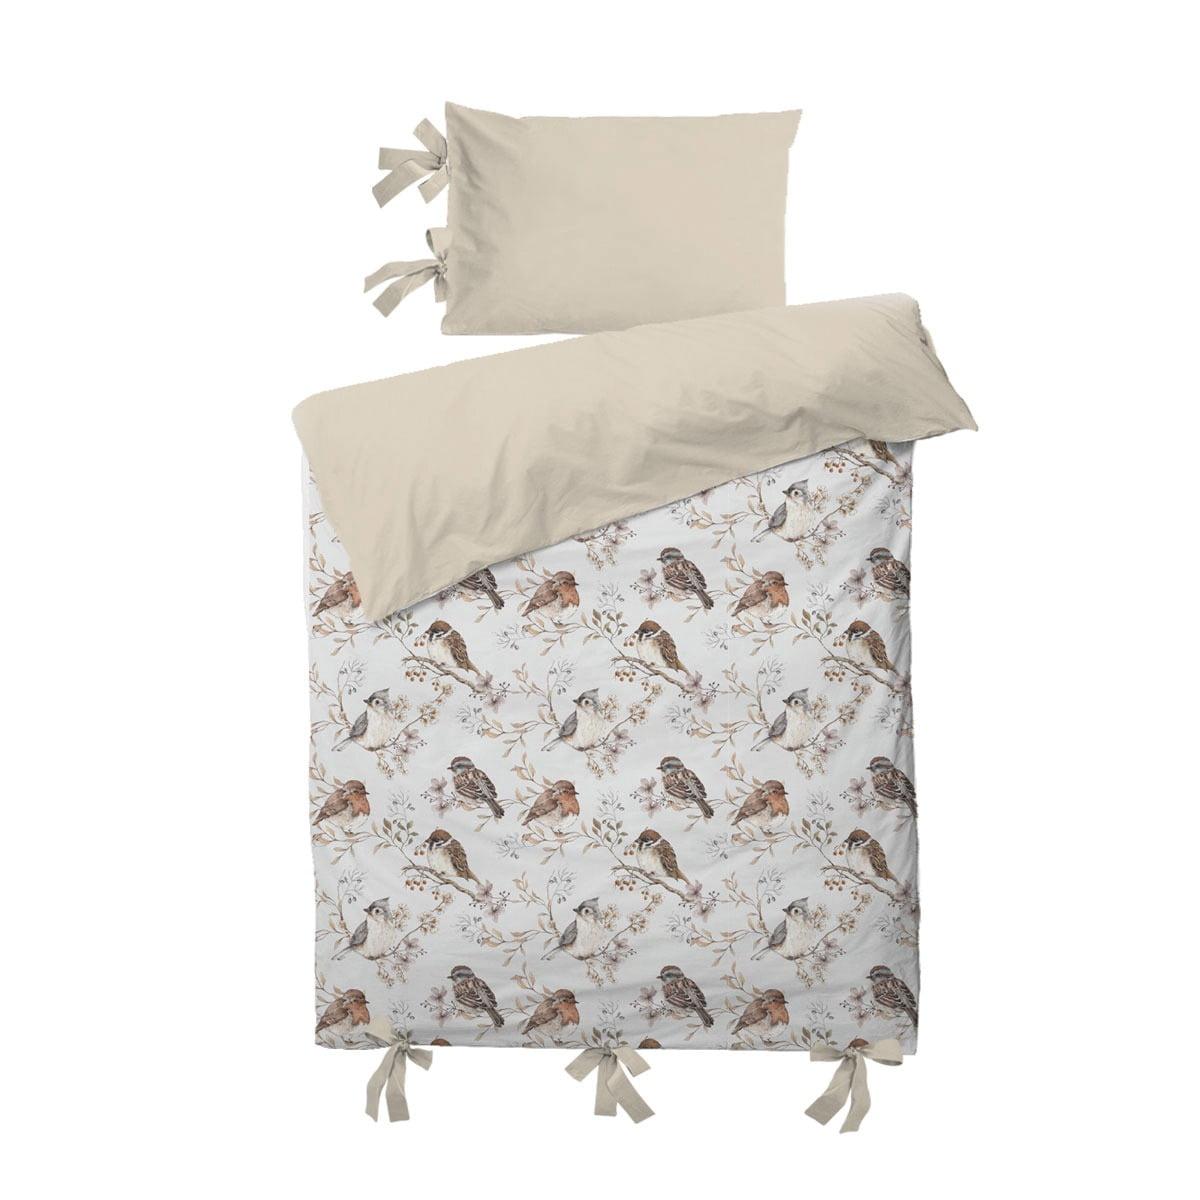 Dekornik-postelna-bielizen-vtacik-1-dadaboom-sk